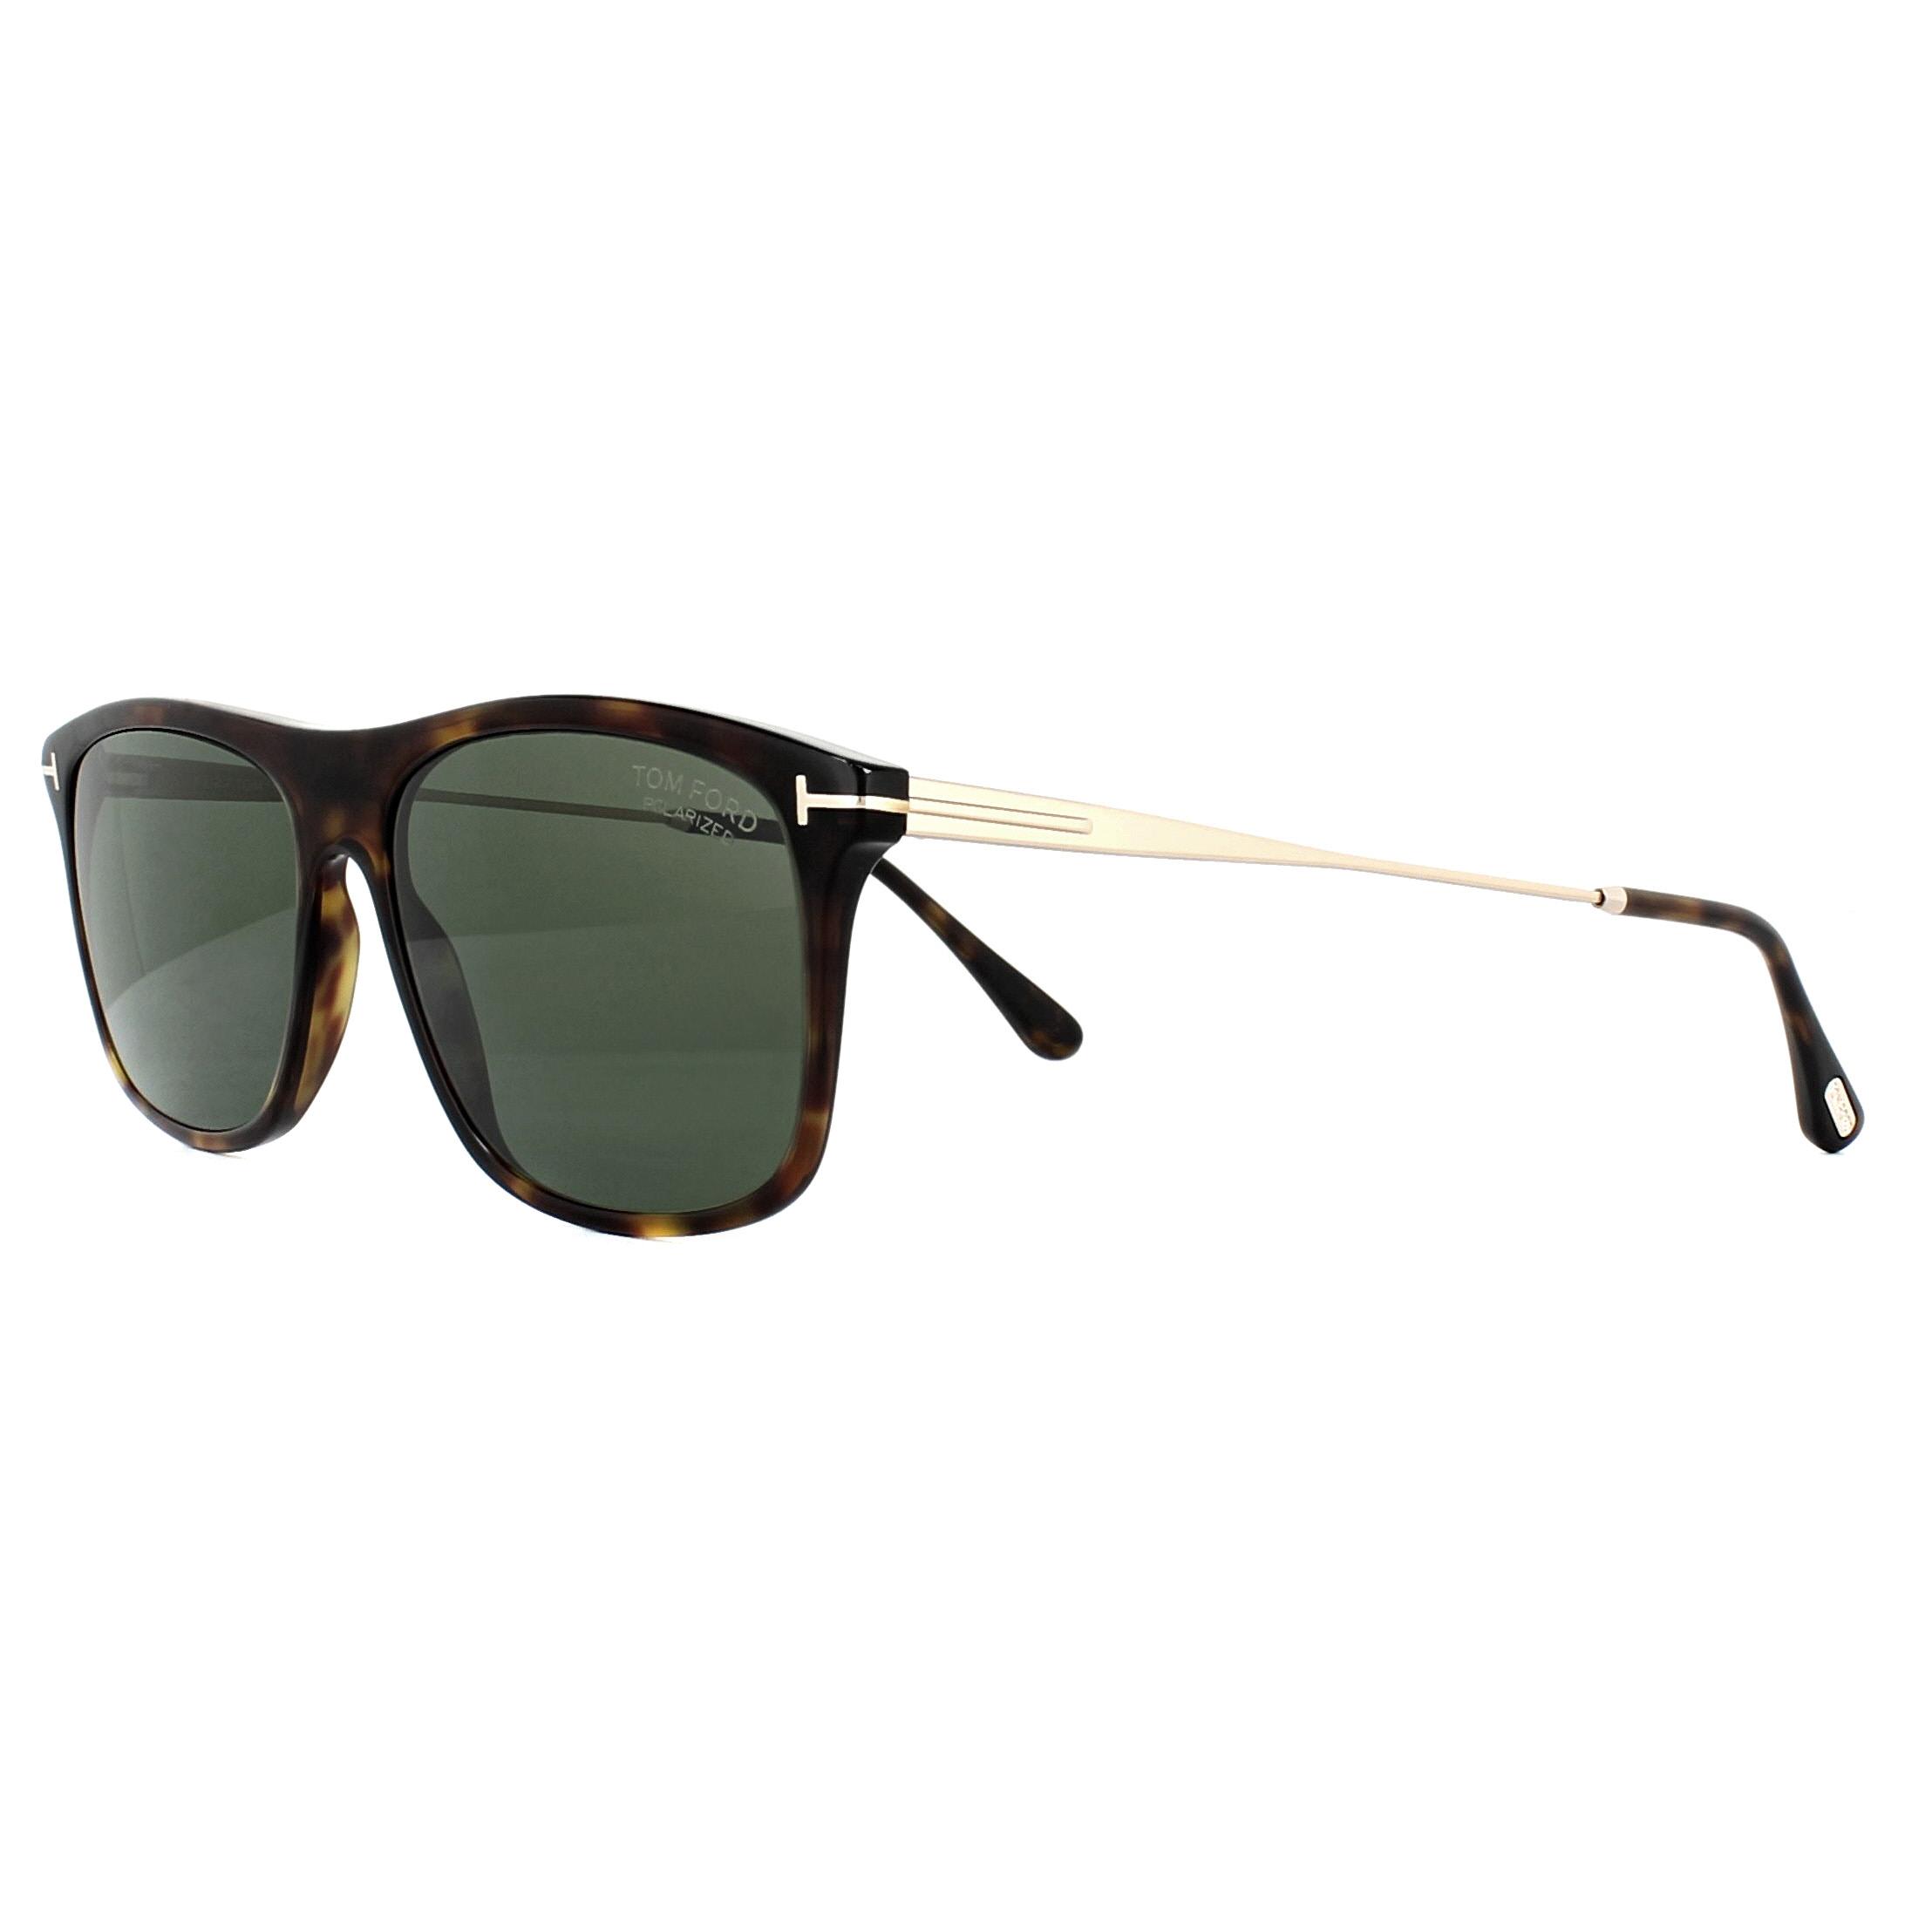 a097b68f8f5e Sentinel Tom Ford Sunglasses 0588 Max 52R Dark Havana Green Polarized